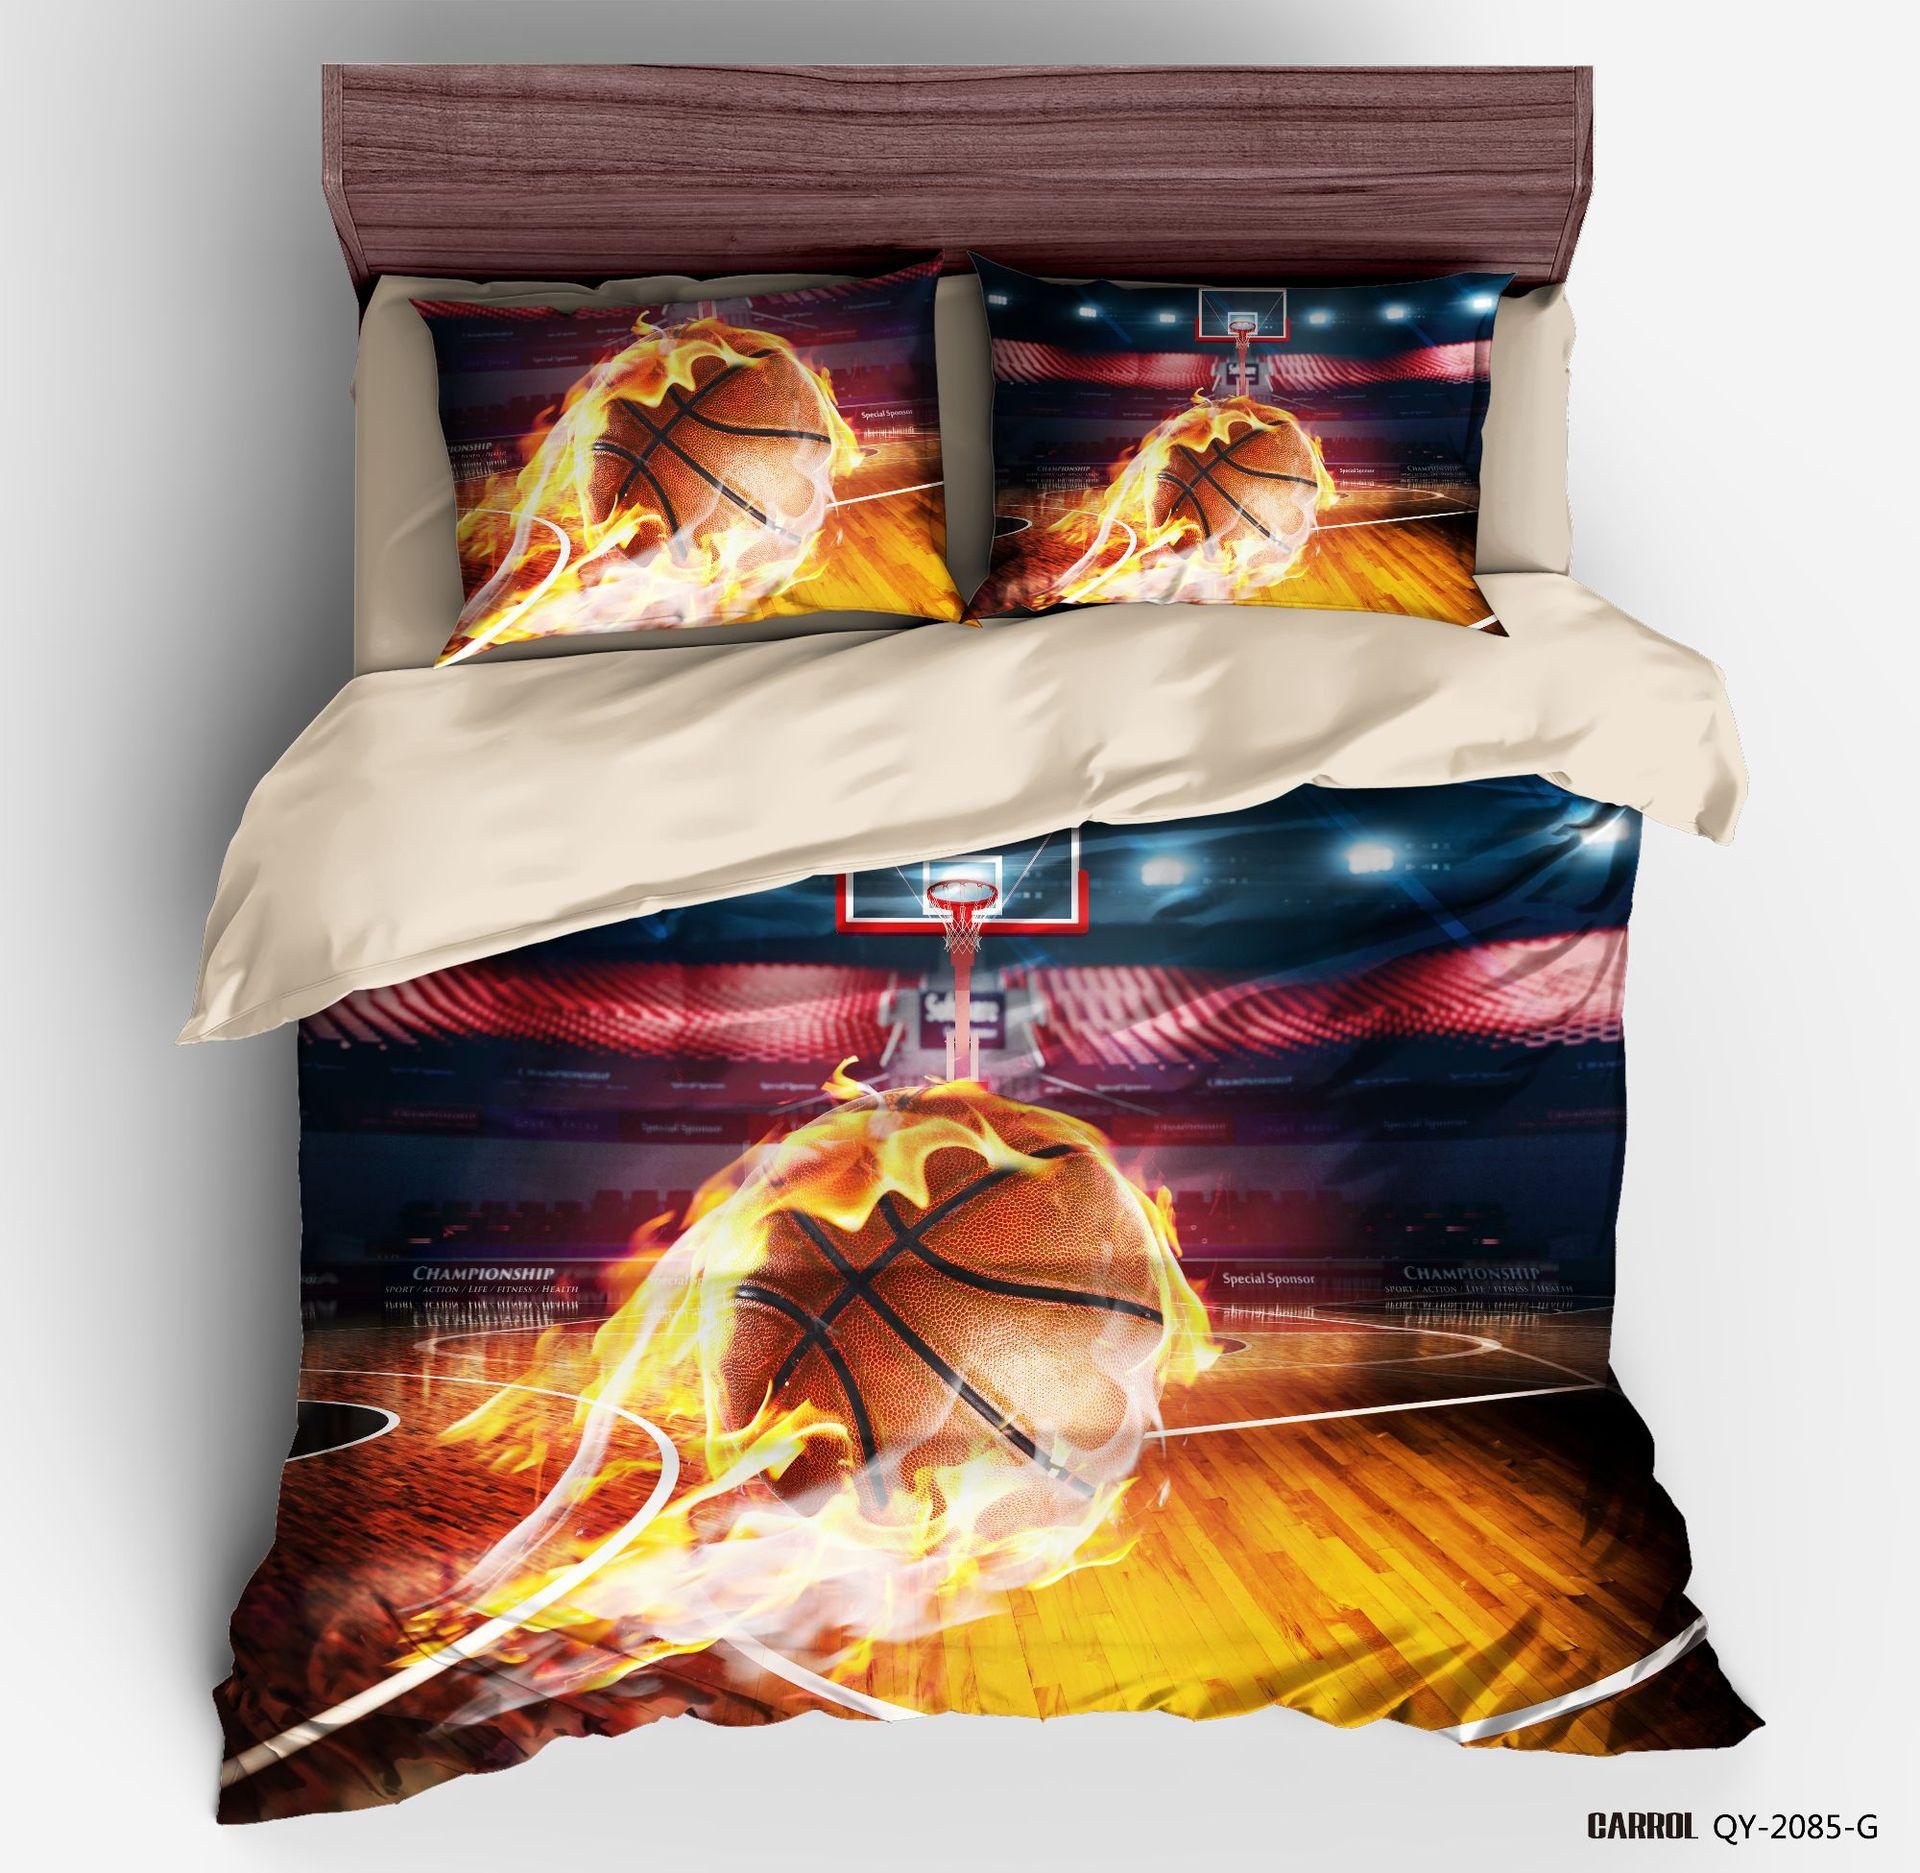 3D Digital Printing Football king size Bedding Set Soccer Ball fire Net Duvet Cover Sets 100% Microfiber comforter bedding sets